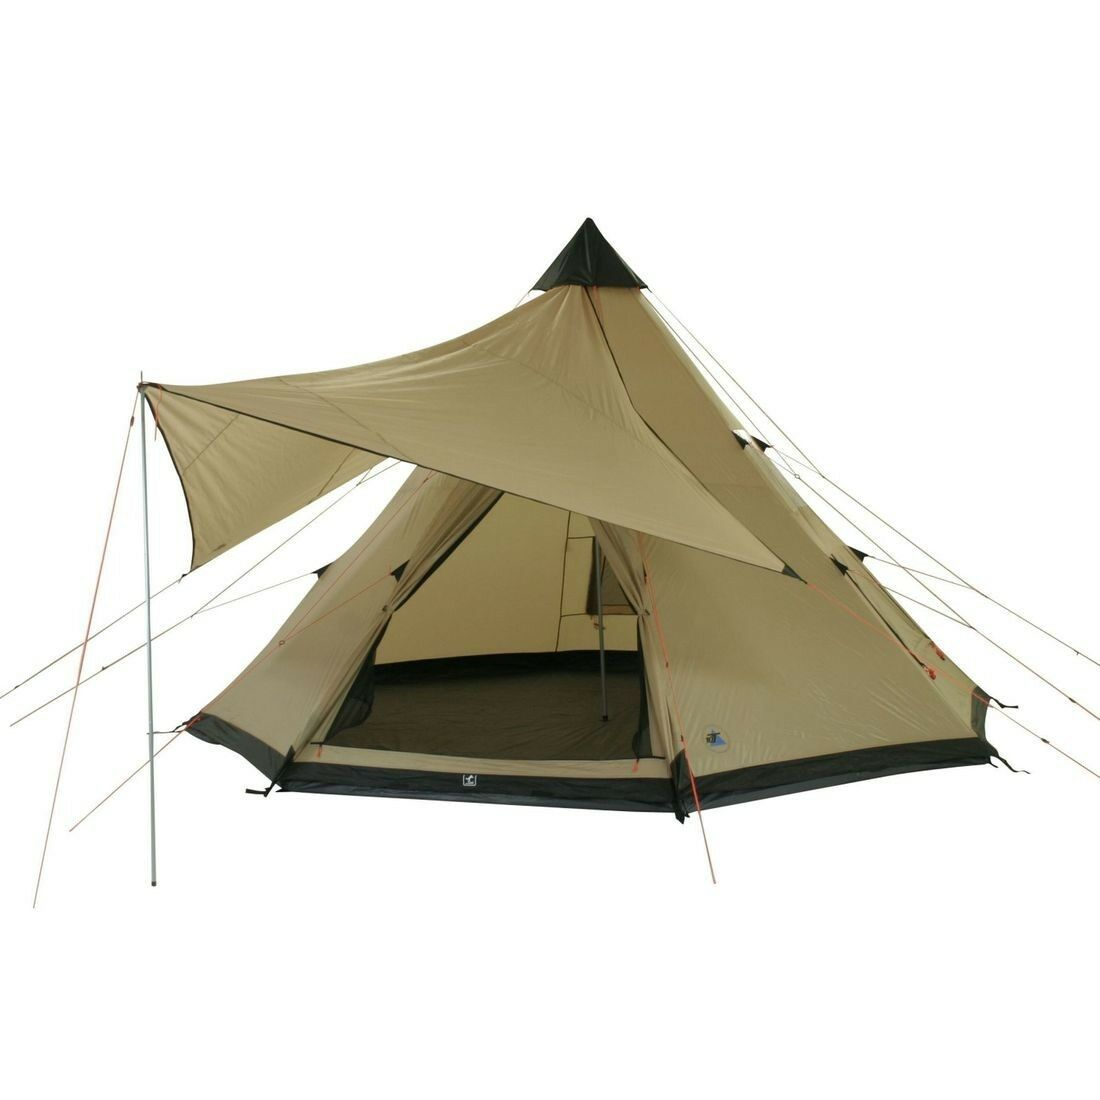 10T Camping-Zelt Shoshone 500 10 Personen Tipi Pyramide… | 04260181762449